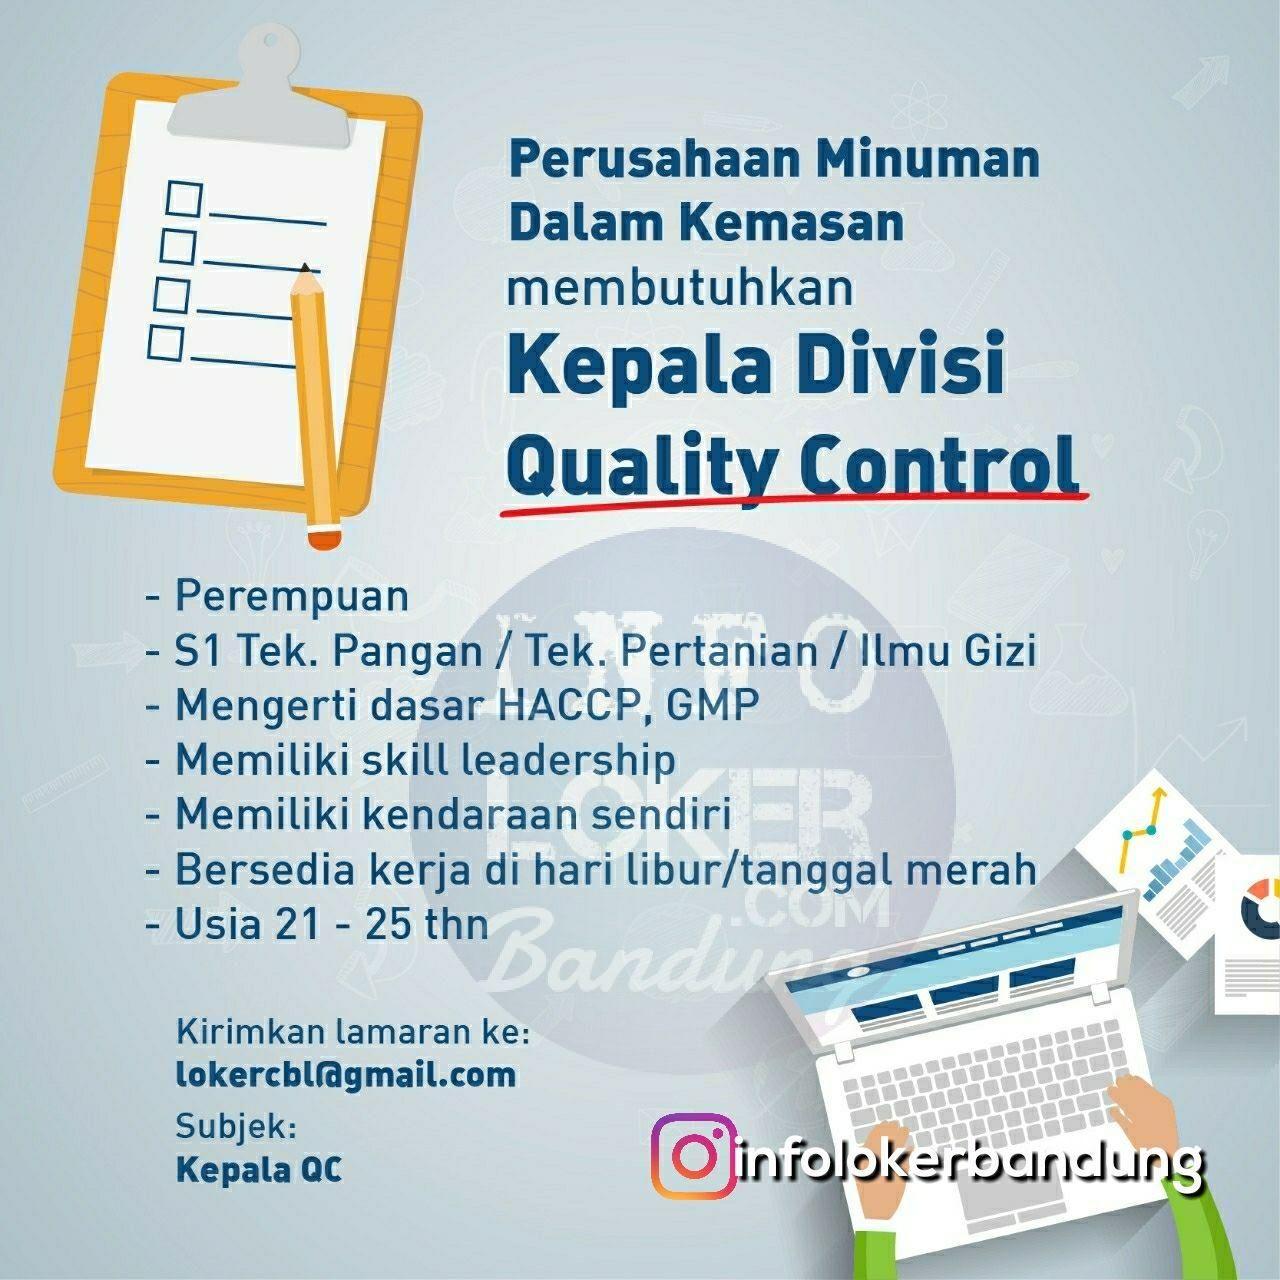 Lowongan Kerja Qc Surabaya